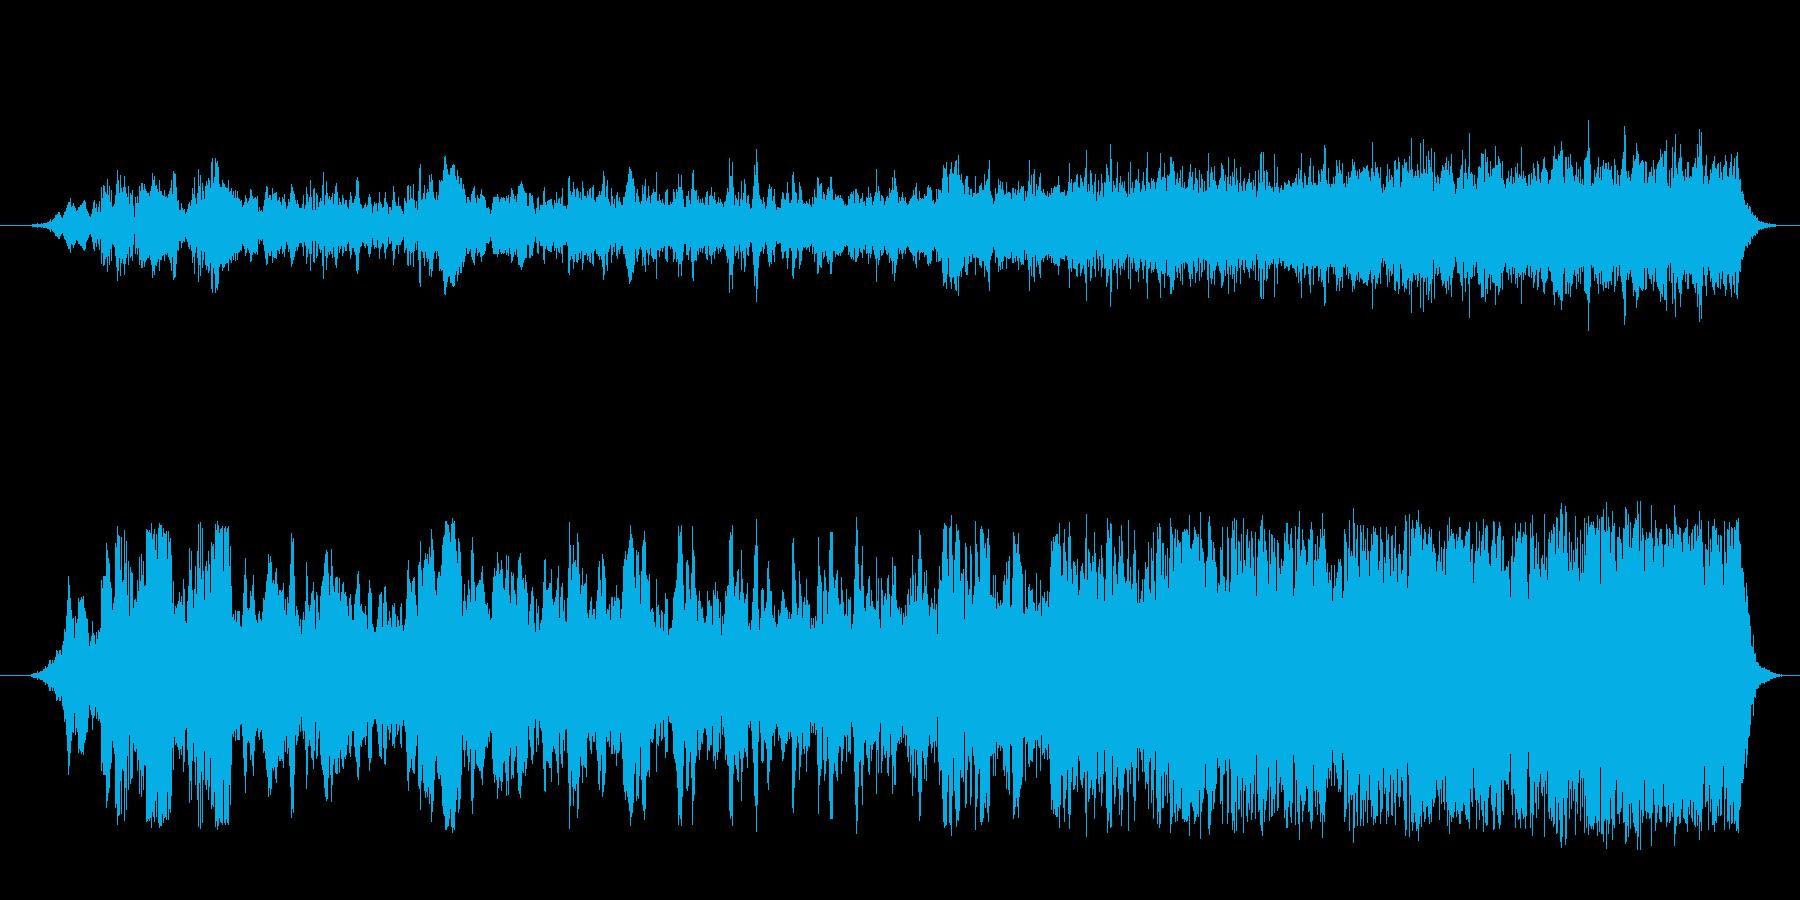 SWELL 位相揺れスウェル03の再生済みの波形